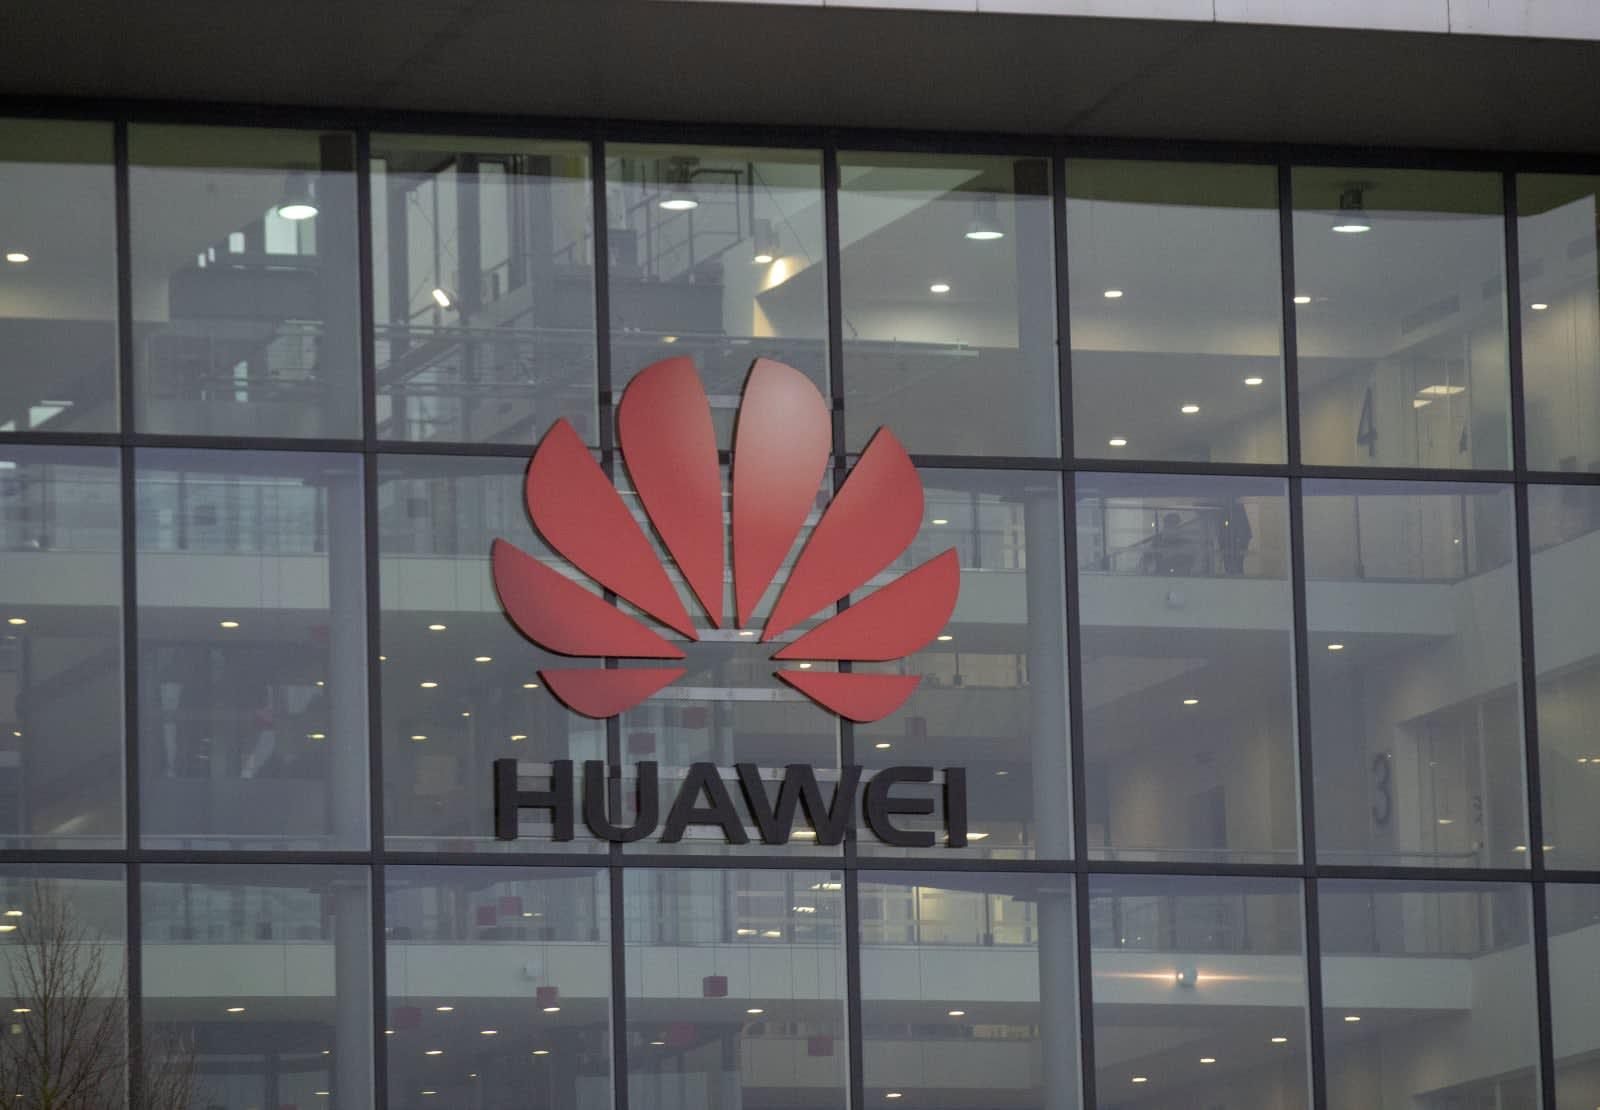 Google just gave Huawei a wakeup call